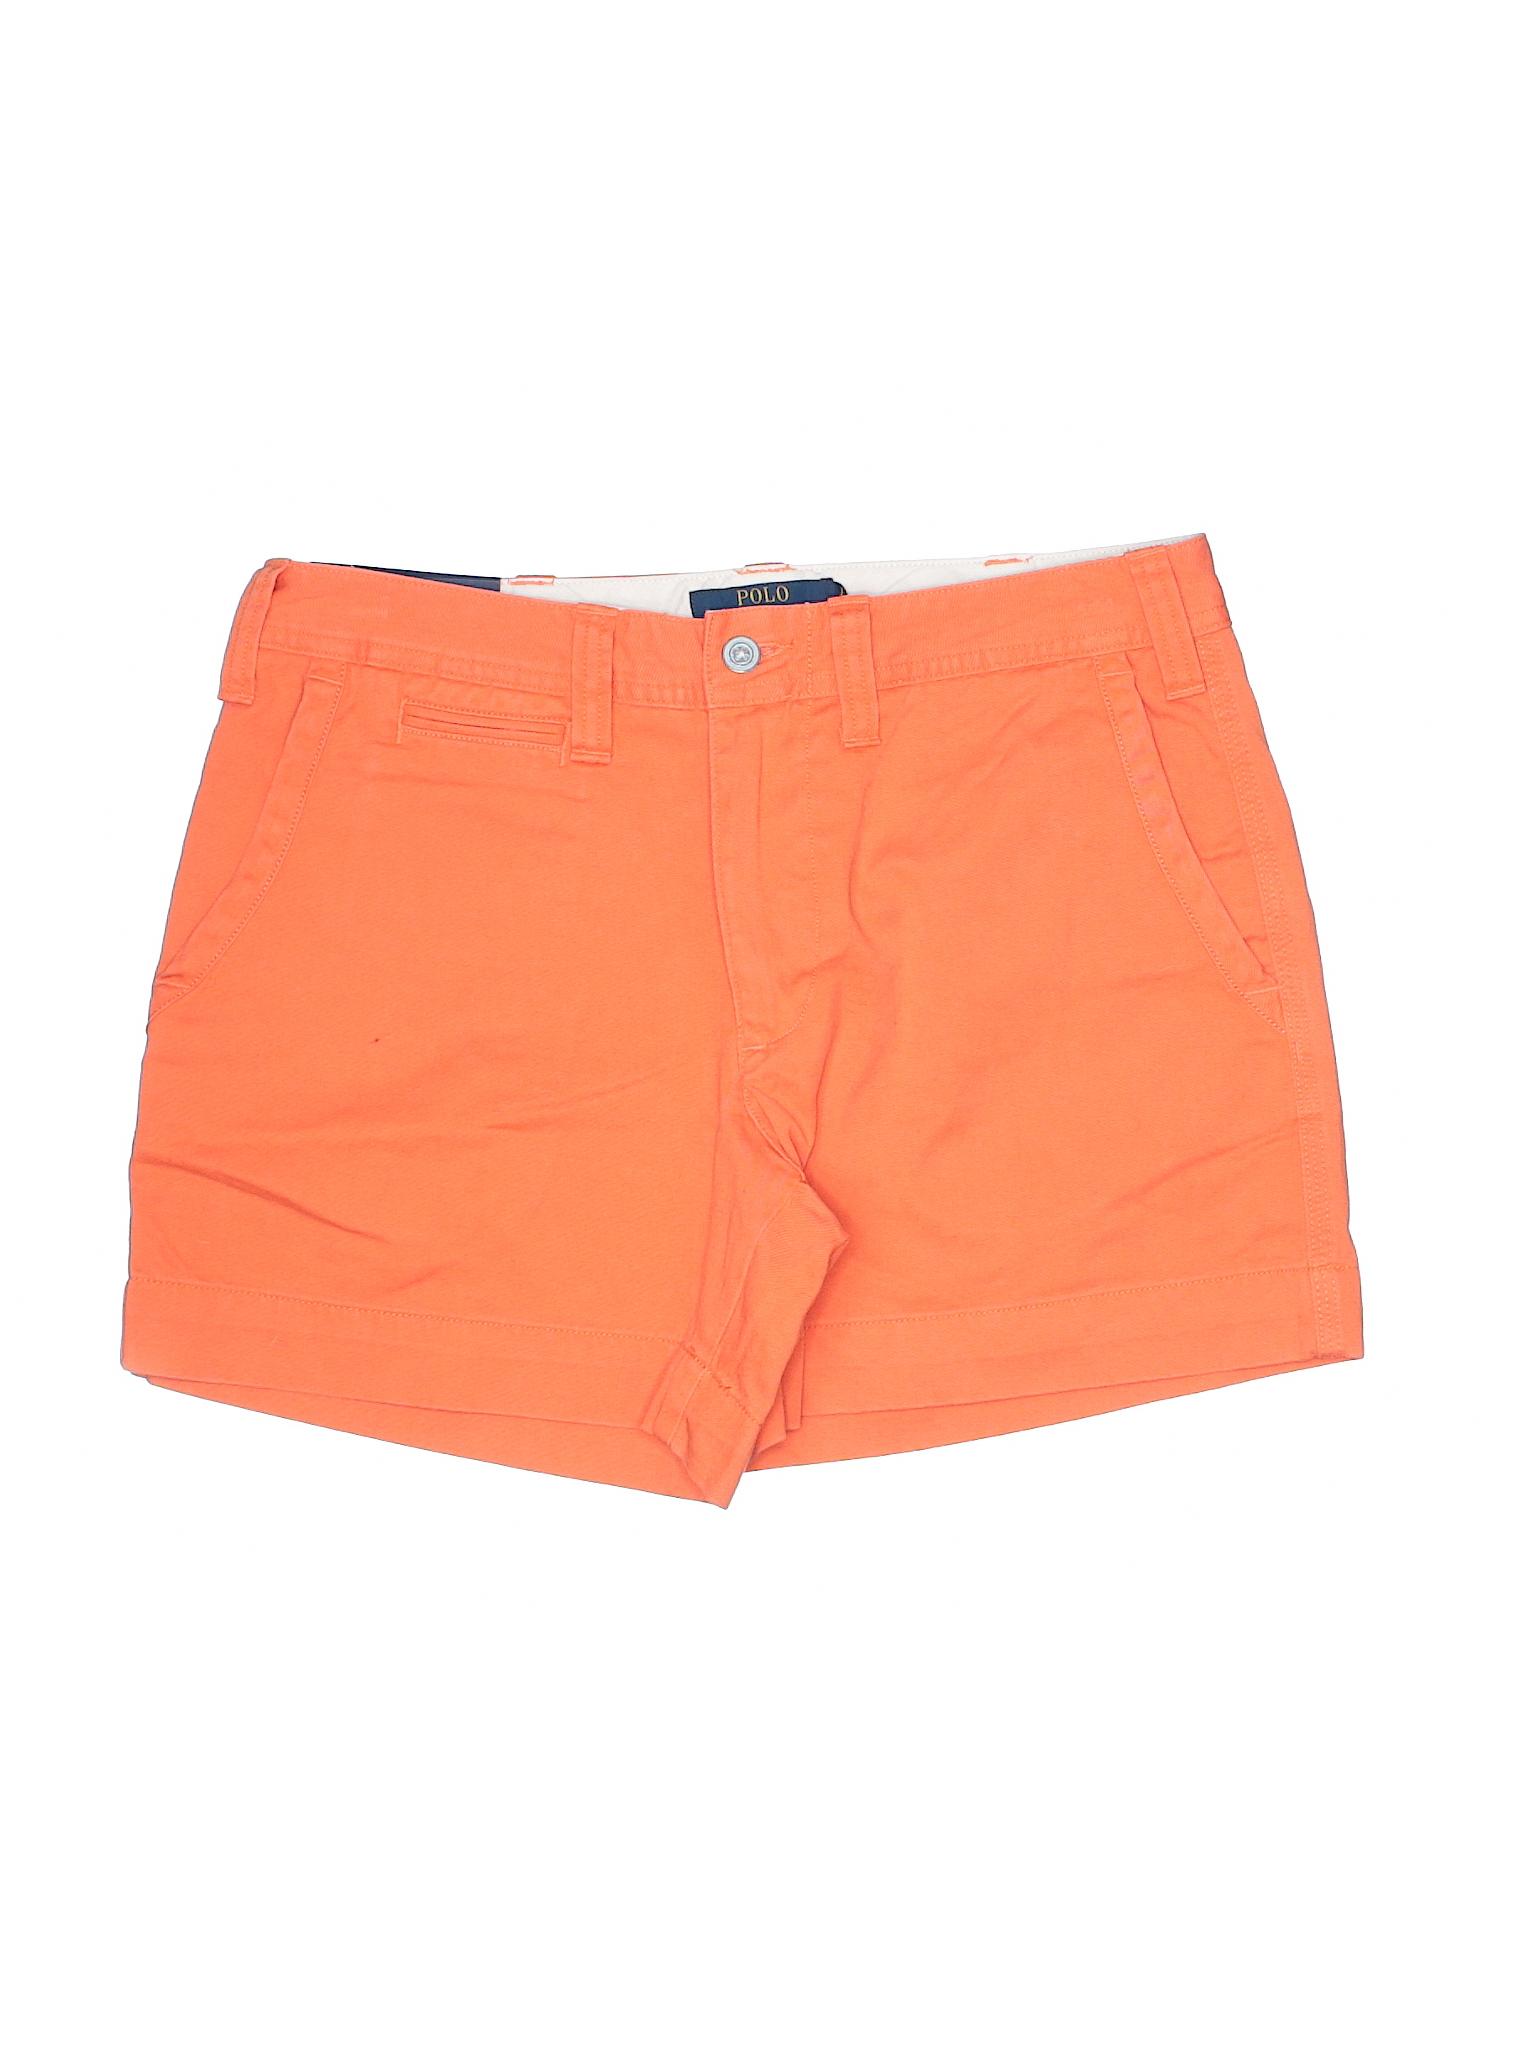 Boutique Polo Khaki Shorts by Lauren Ralph xIIqwdTrH